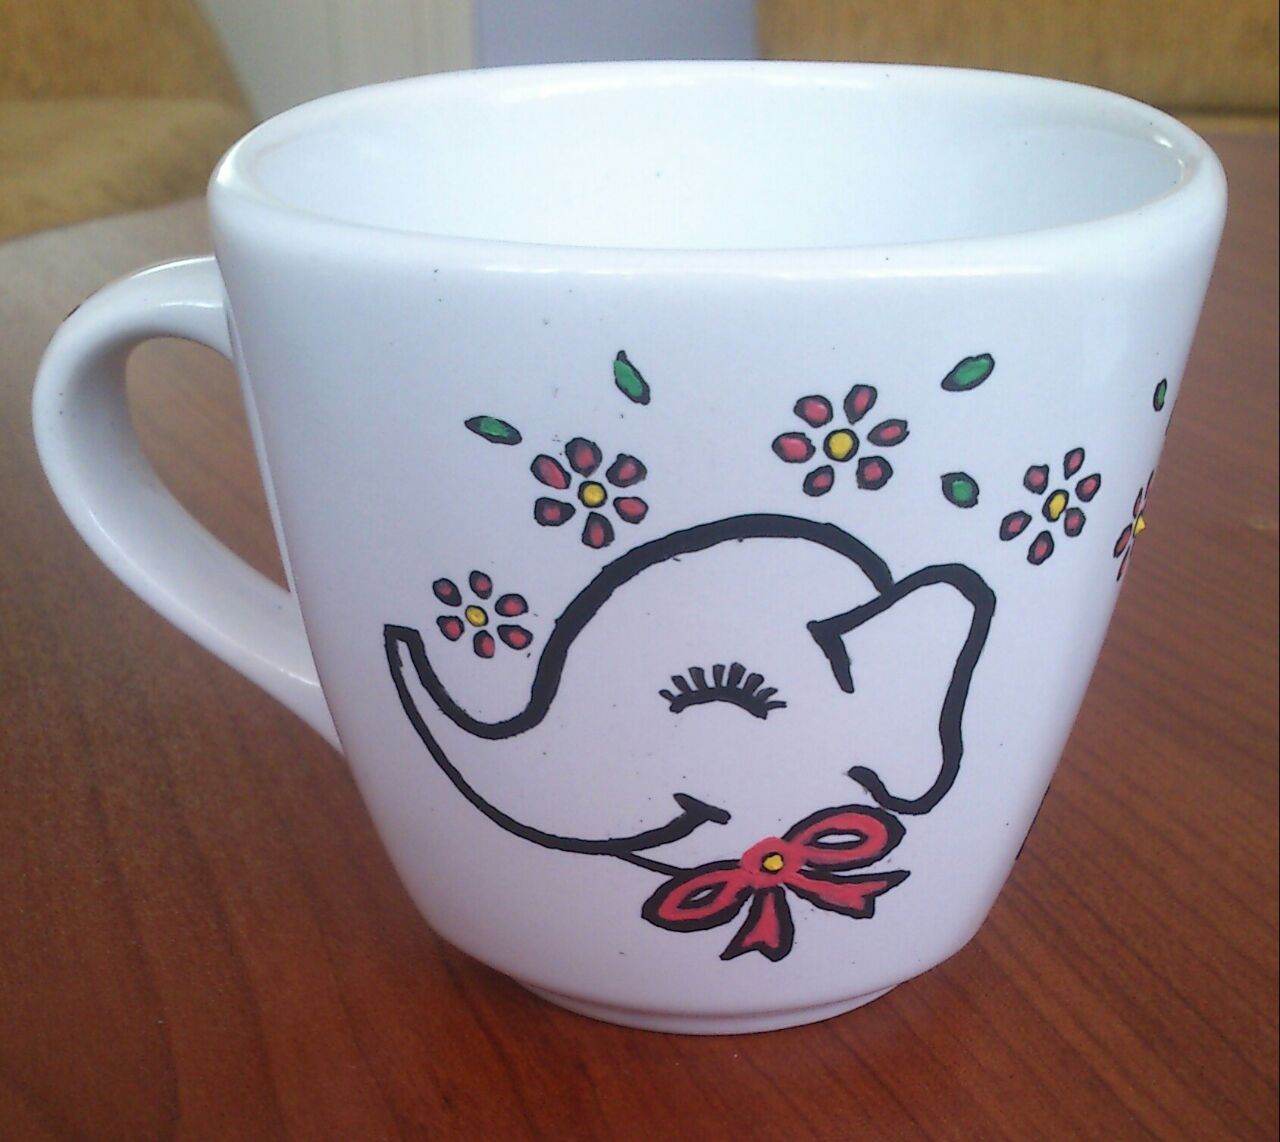 Porselen Bardak Boyama Tavsiye Tableware Mugs Ve Kitchen